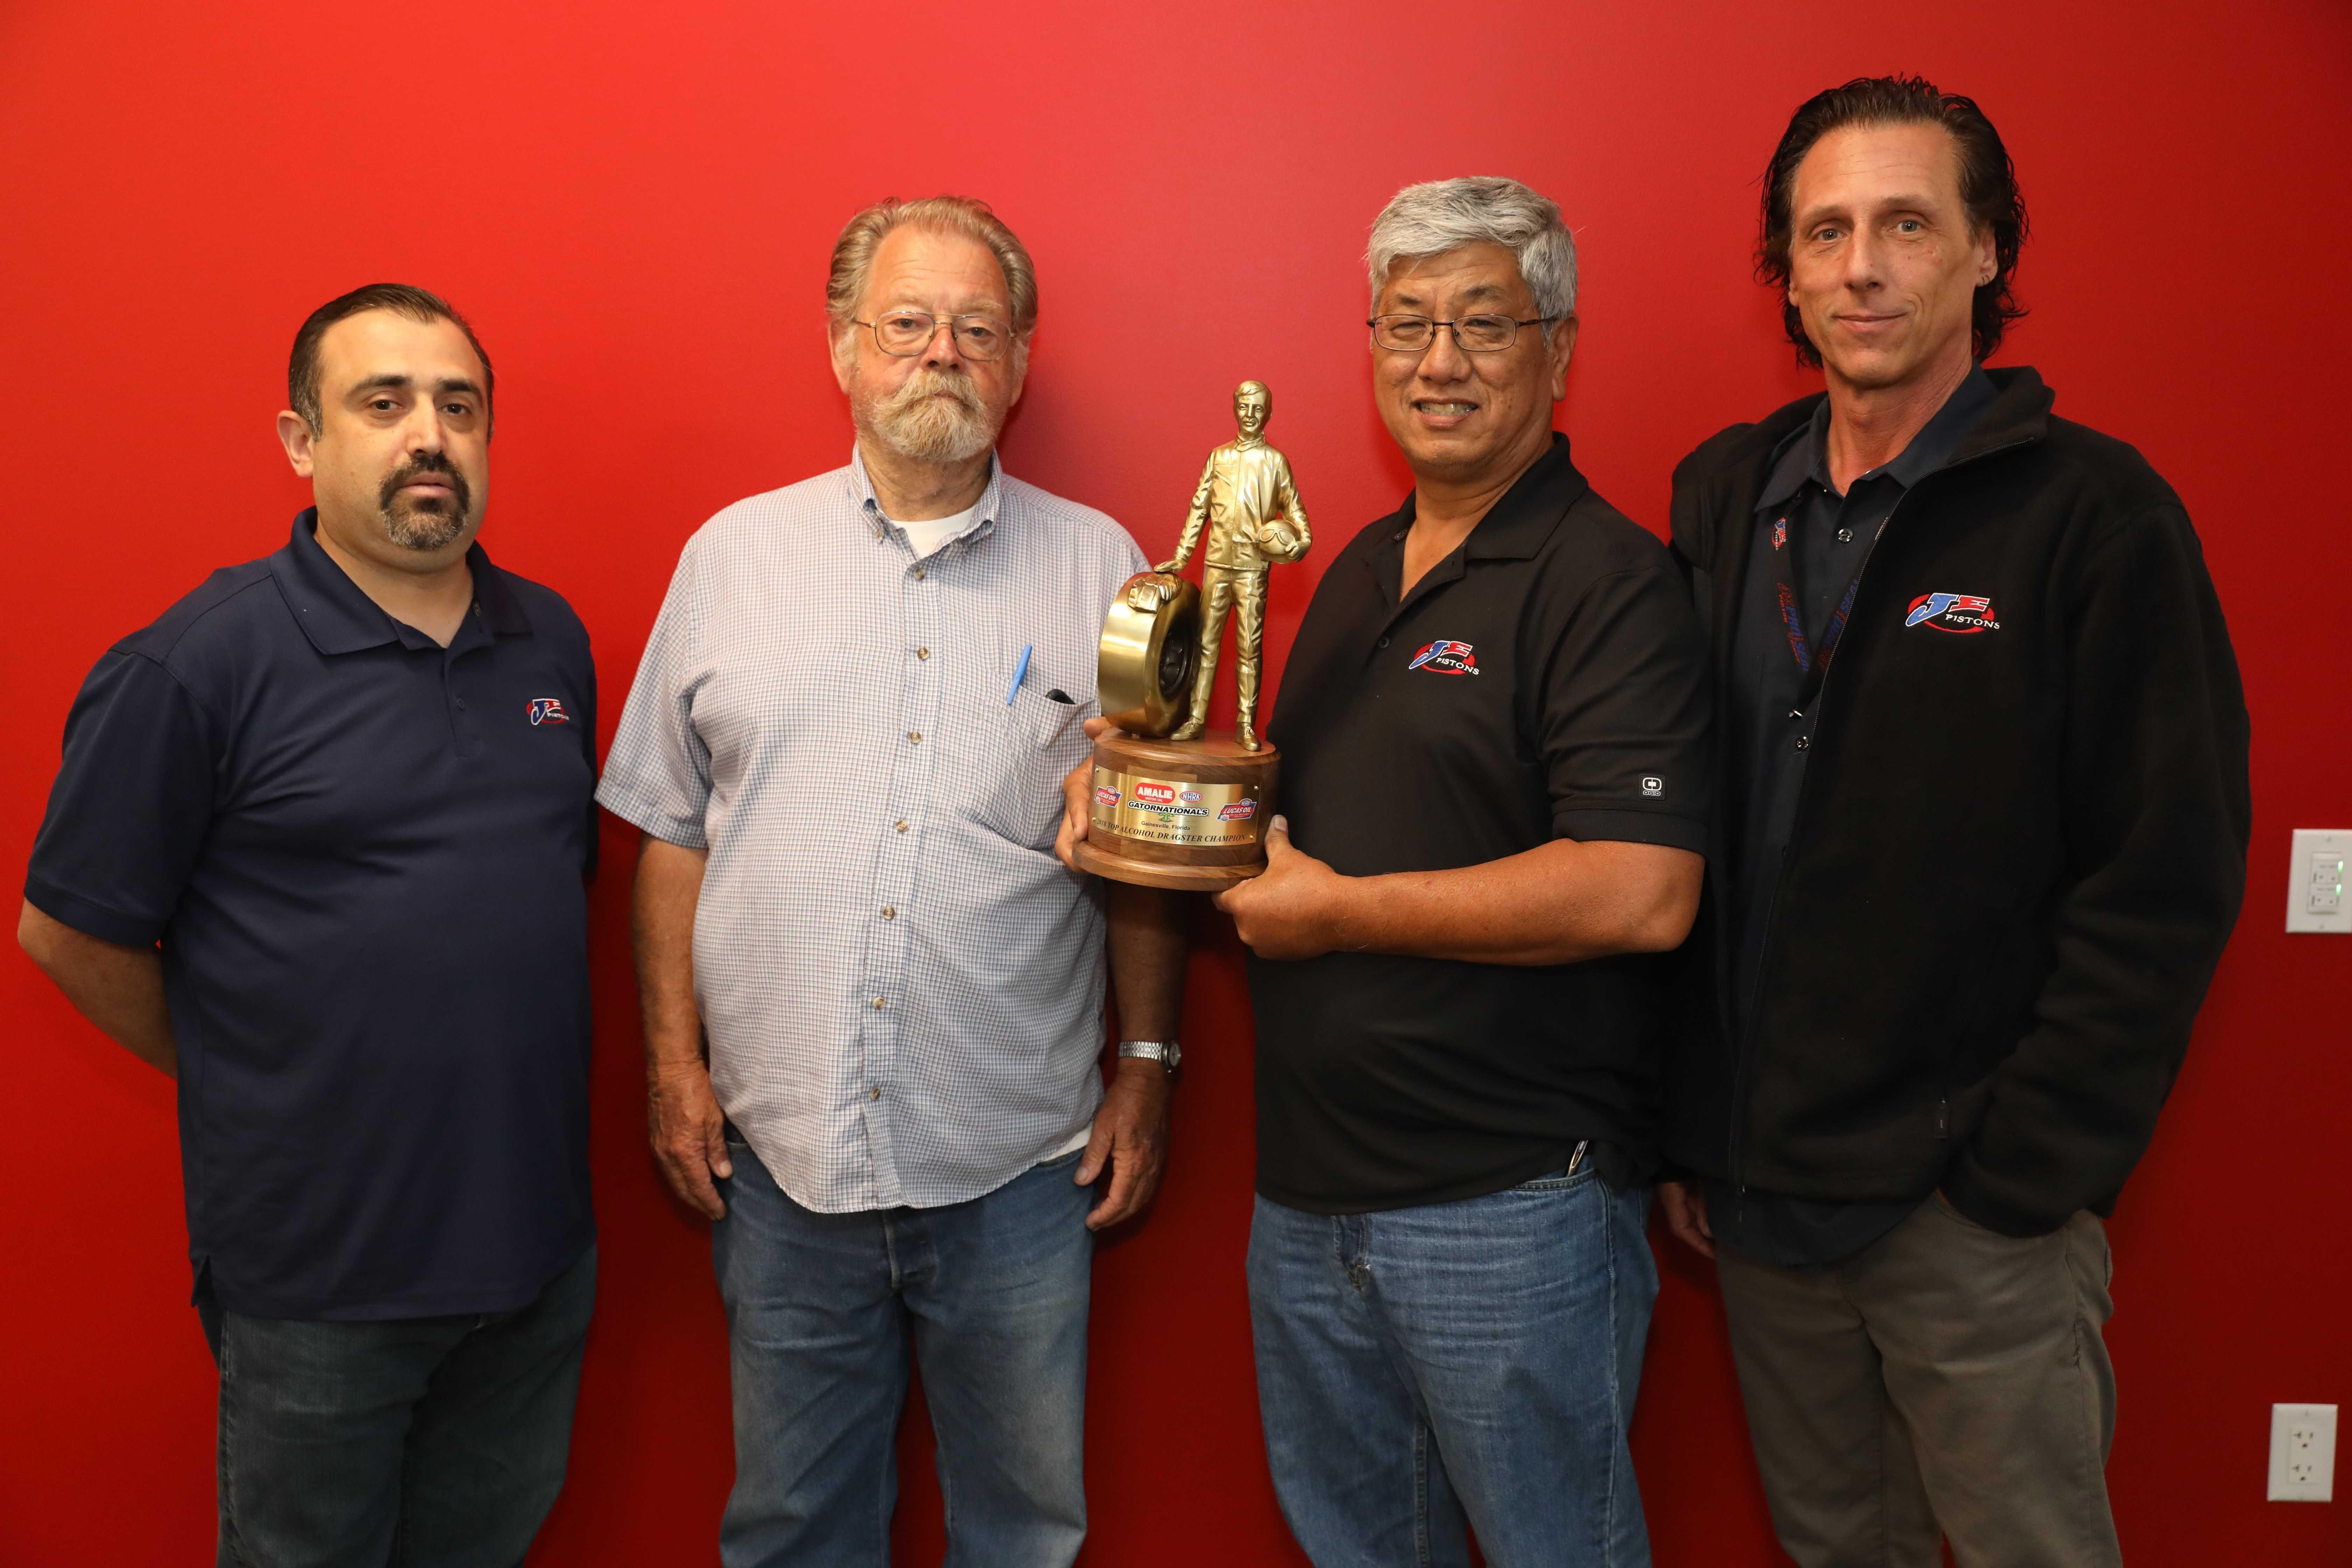 Racer Spotlight: NHRA Top Alcohol Driver, Chris Demke